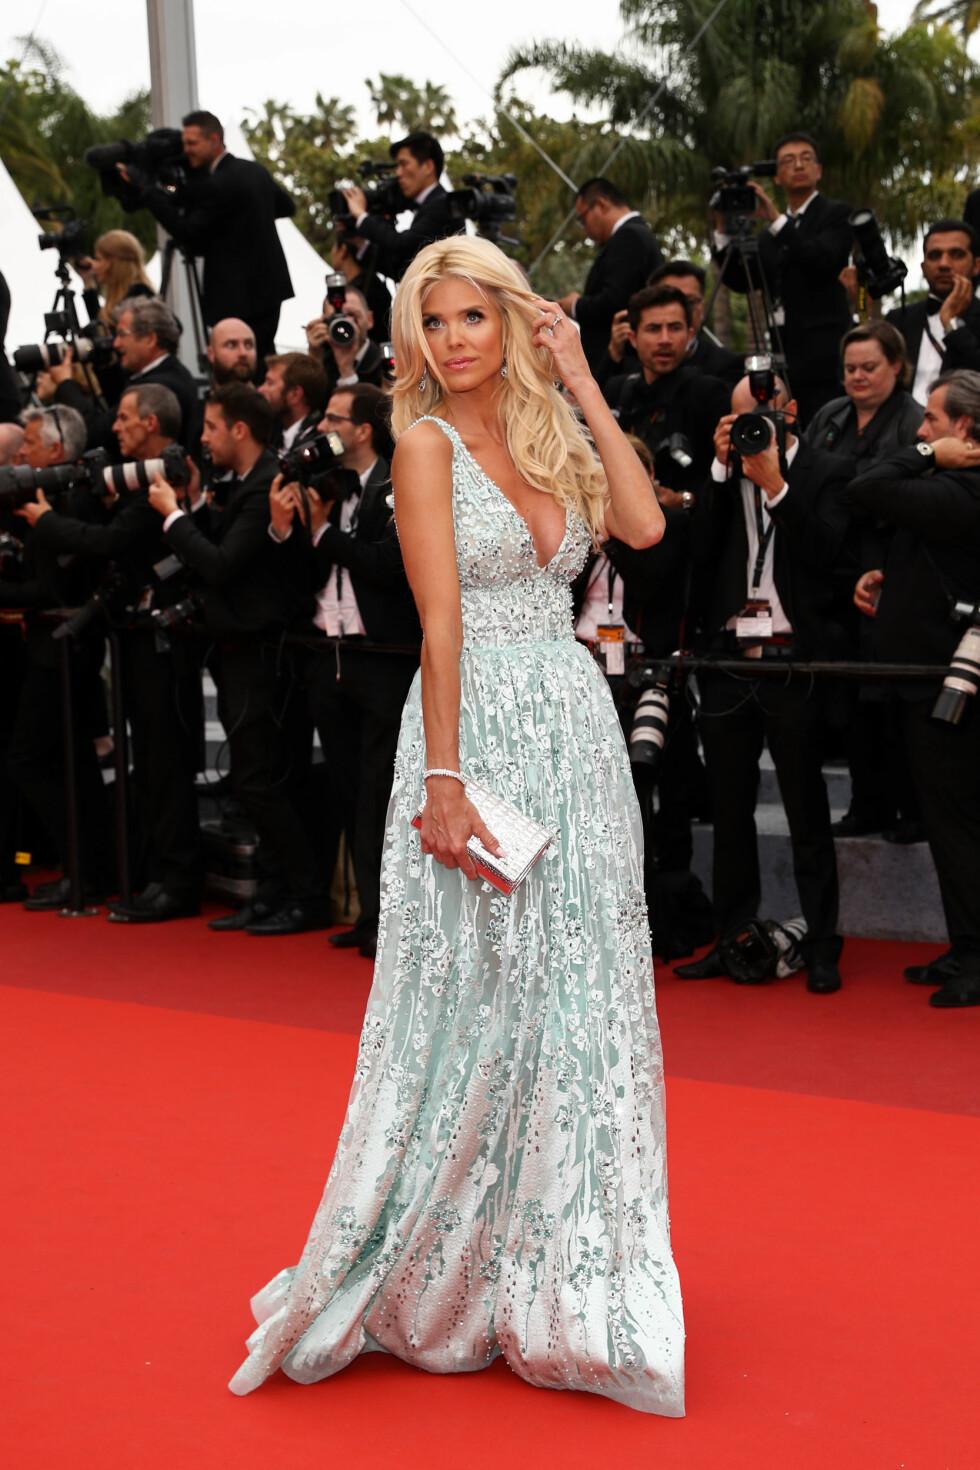 GLITRET: Den svenske modellen Victoria Silvstedt var vårlig antrukket i en pastellfarget, brodert blomsterkjole på «Slack Bay»-premieren i Cannes fredag.  Foto: Abaca